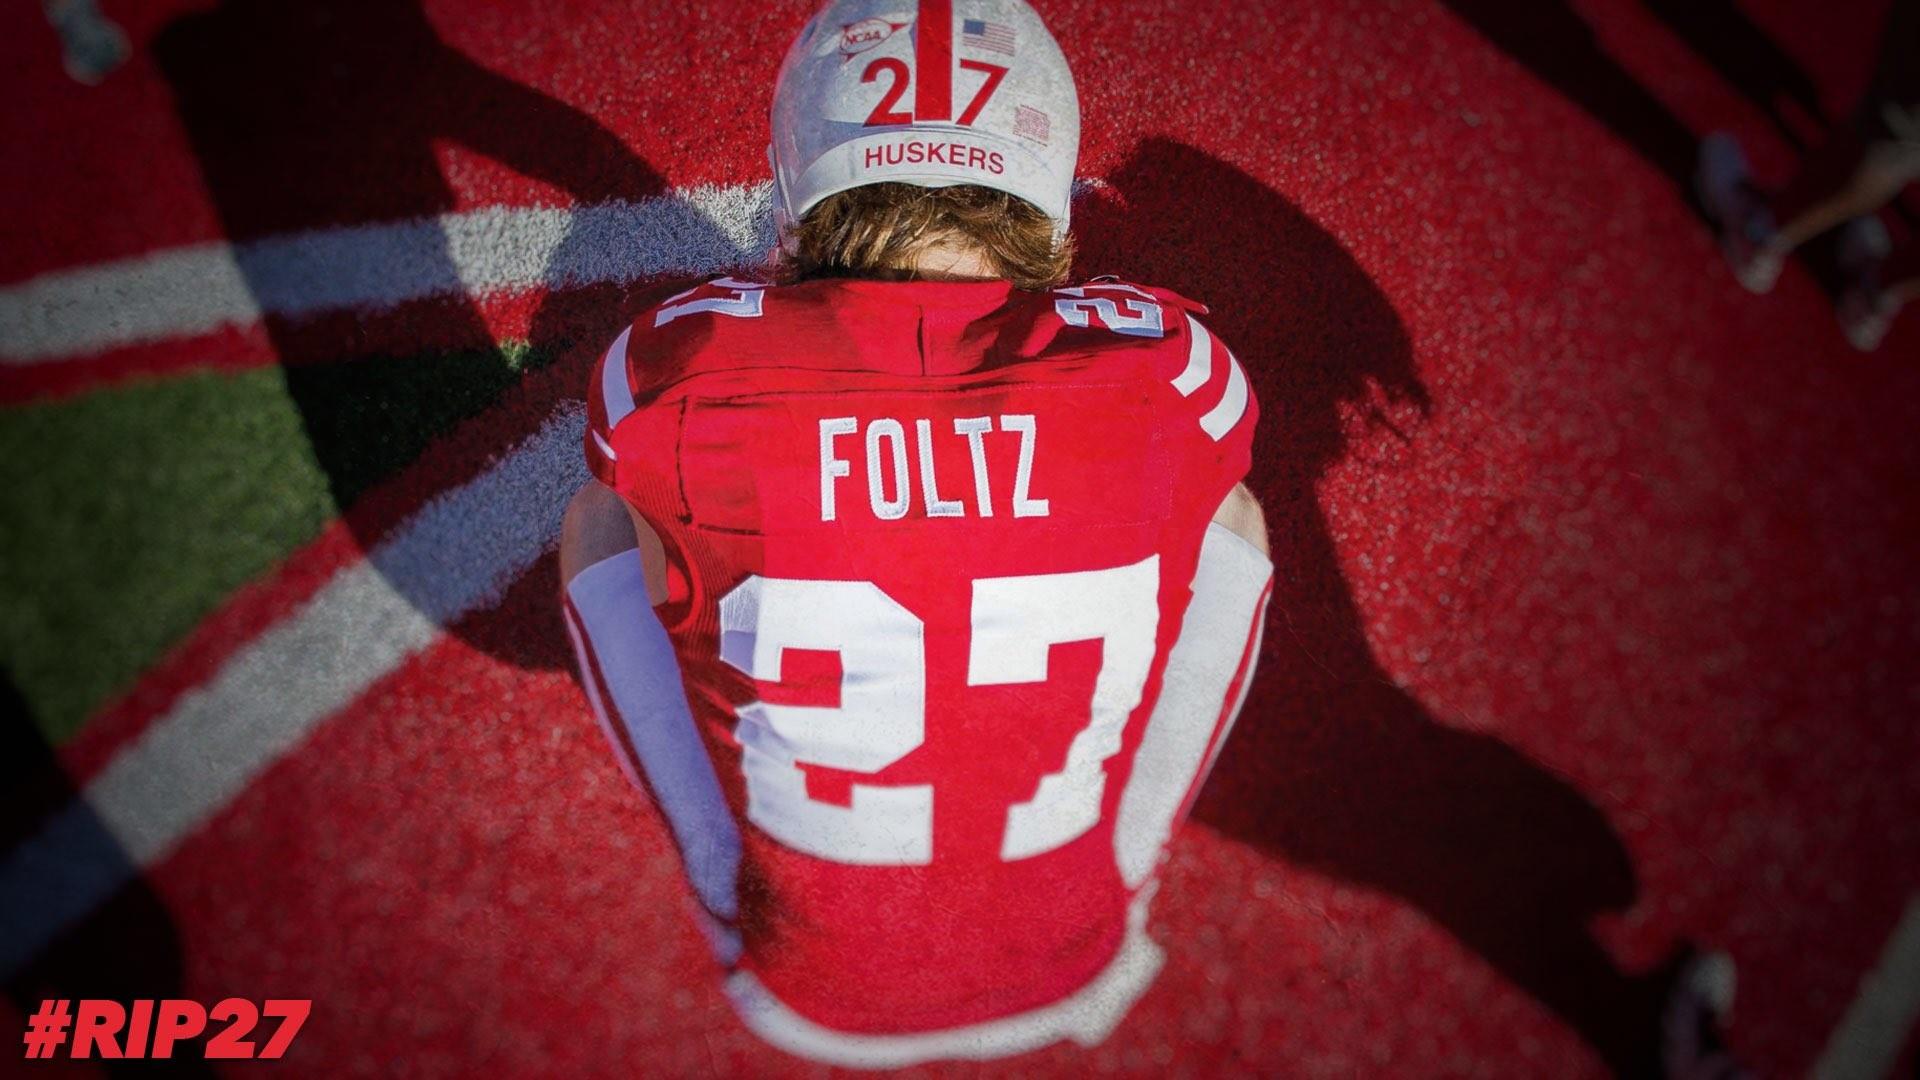 Chancellor Green statement on death of student-athlete Sam Foltz   Nebraska  Today   University of Nebraska–Lincoln